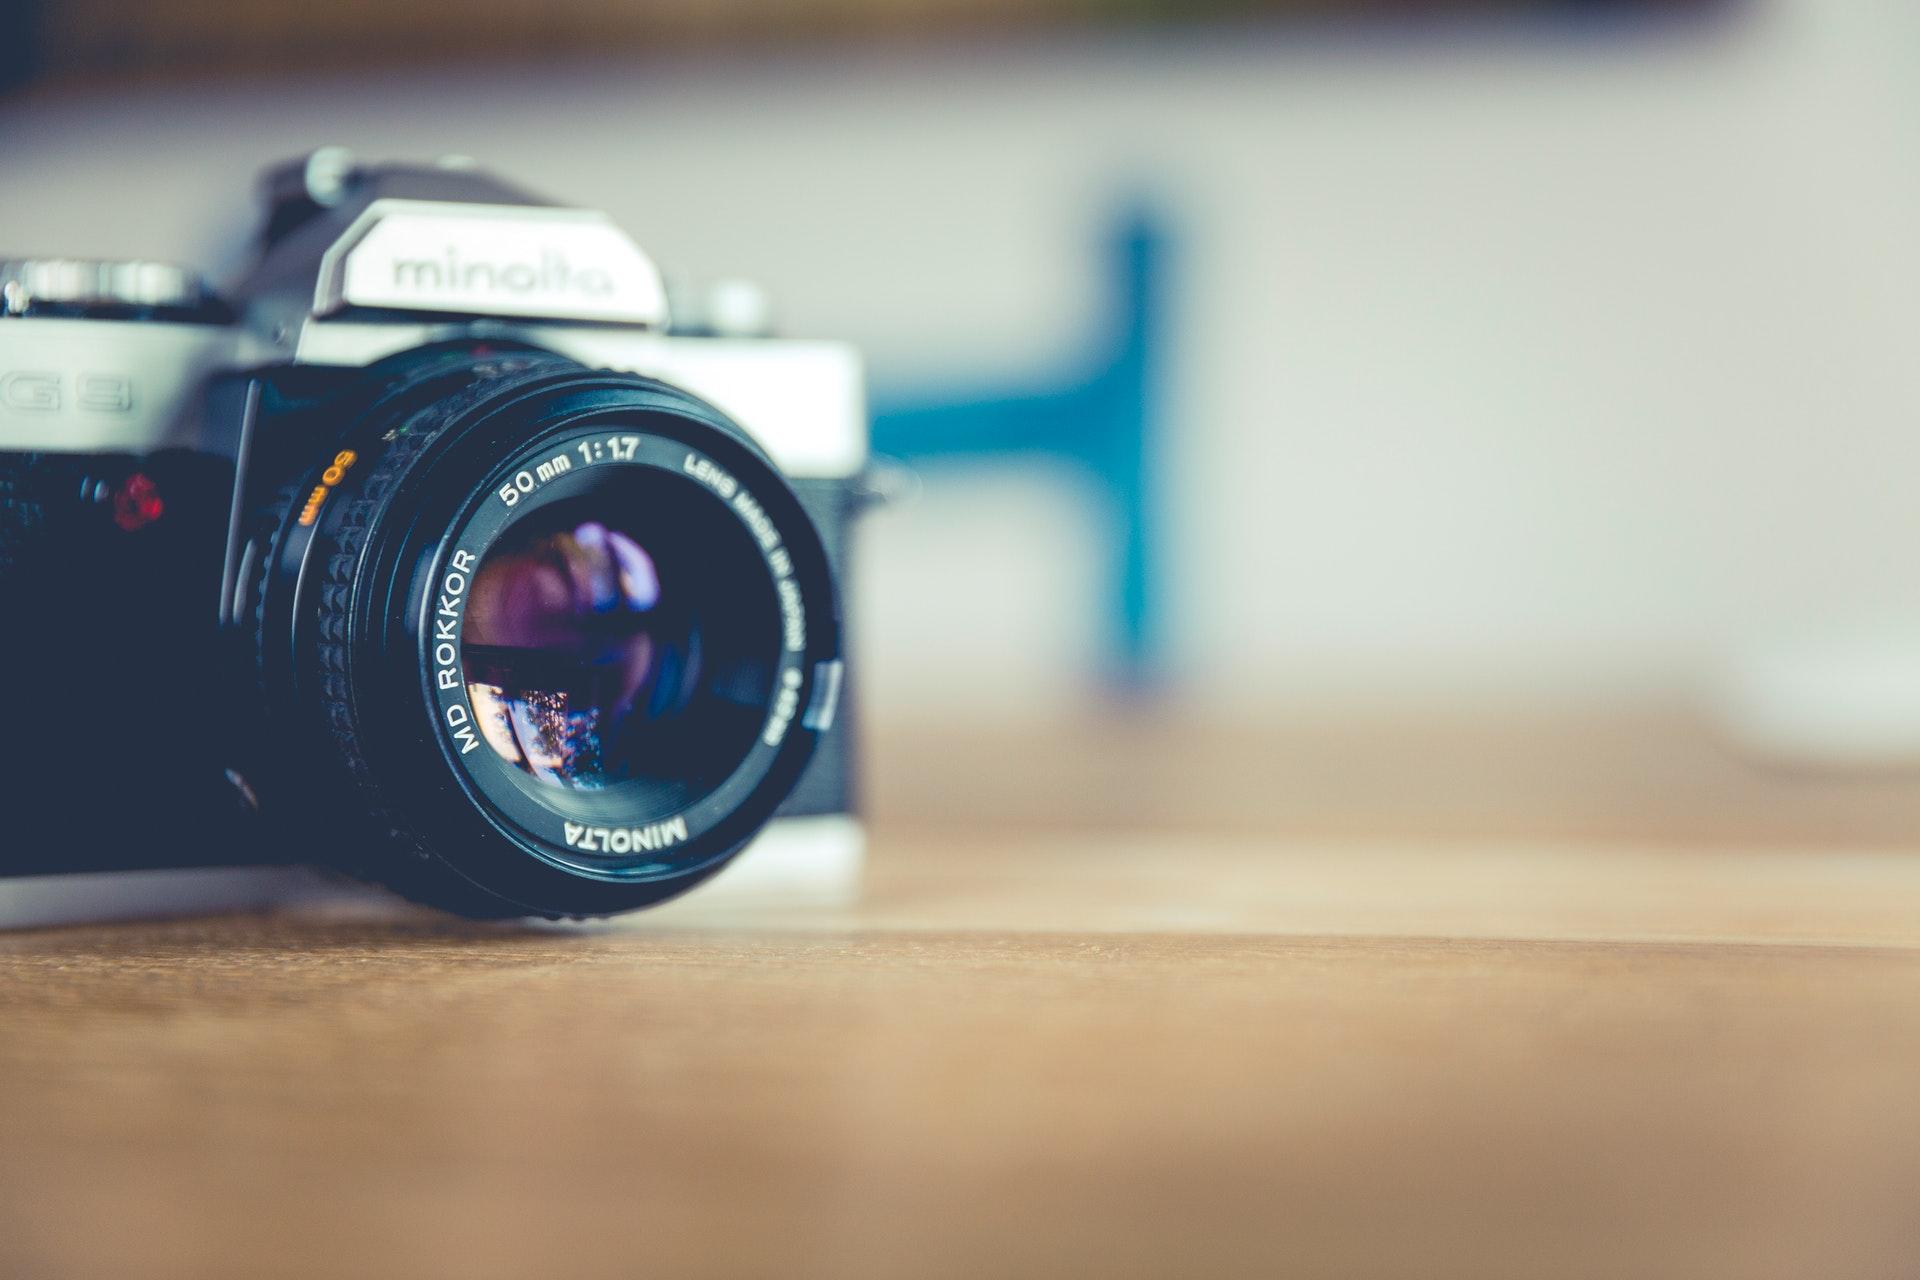 Como me tornei fotógrafo